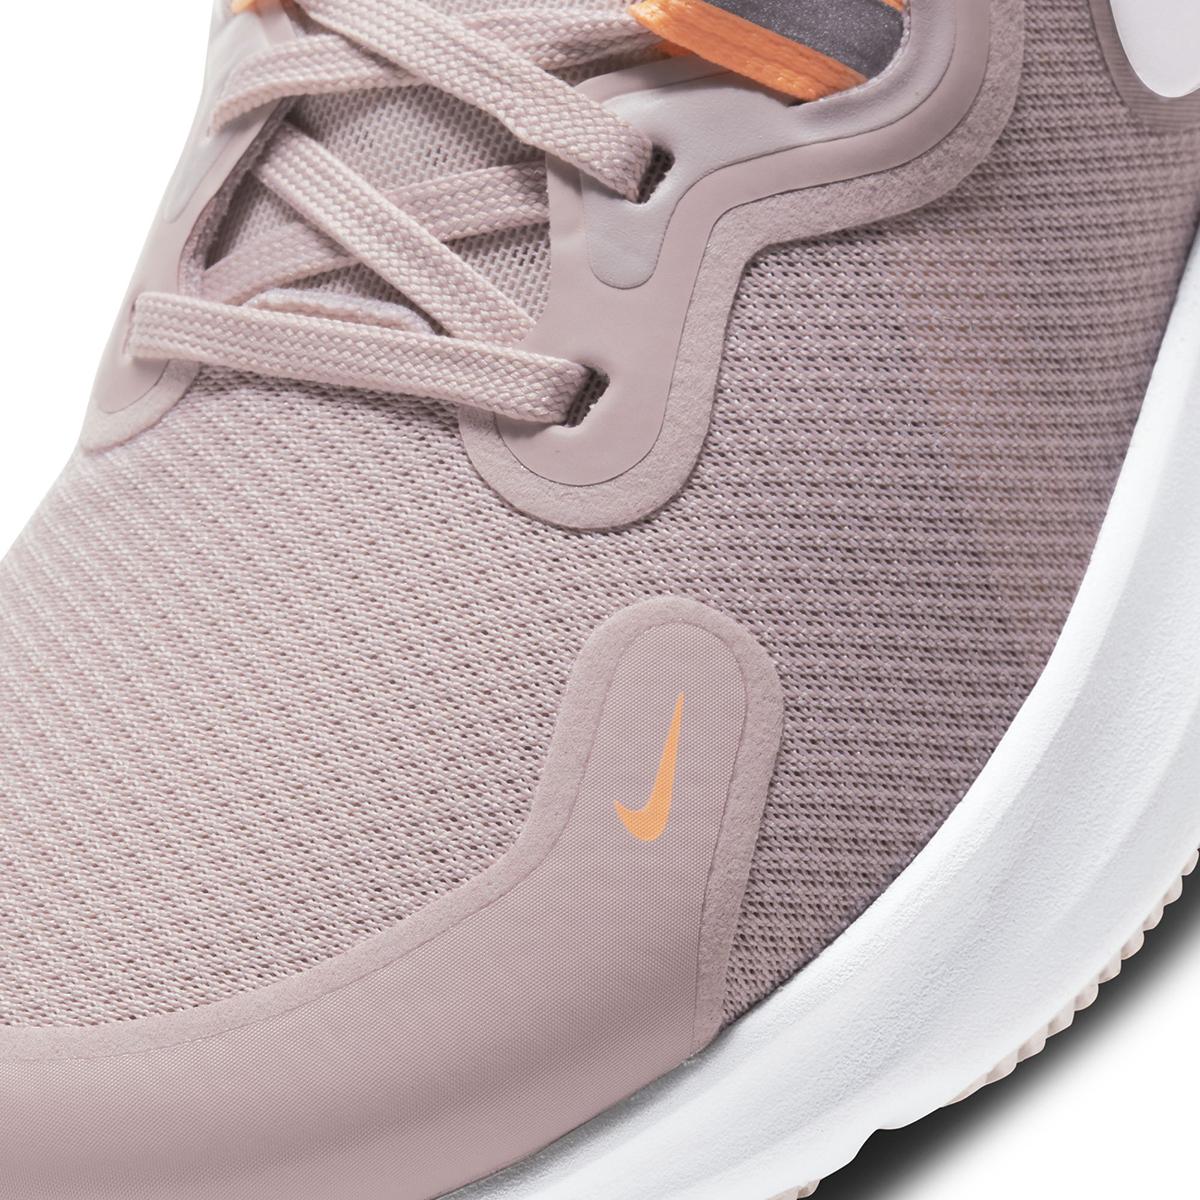 Women's Nike React Miler Running Shoe - Color: Champagne/Orange Pulse/Barely Rose/White (Regular Width) - Size: 5, Champagne/Orange Pulse/Barely Rose/White, large, image 7